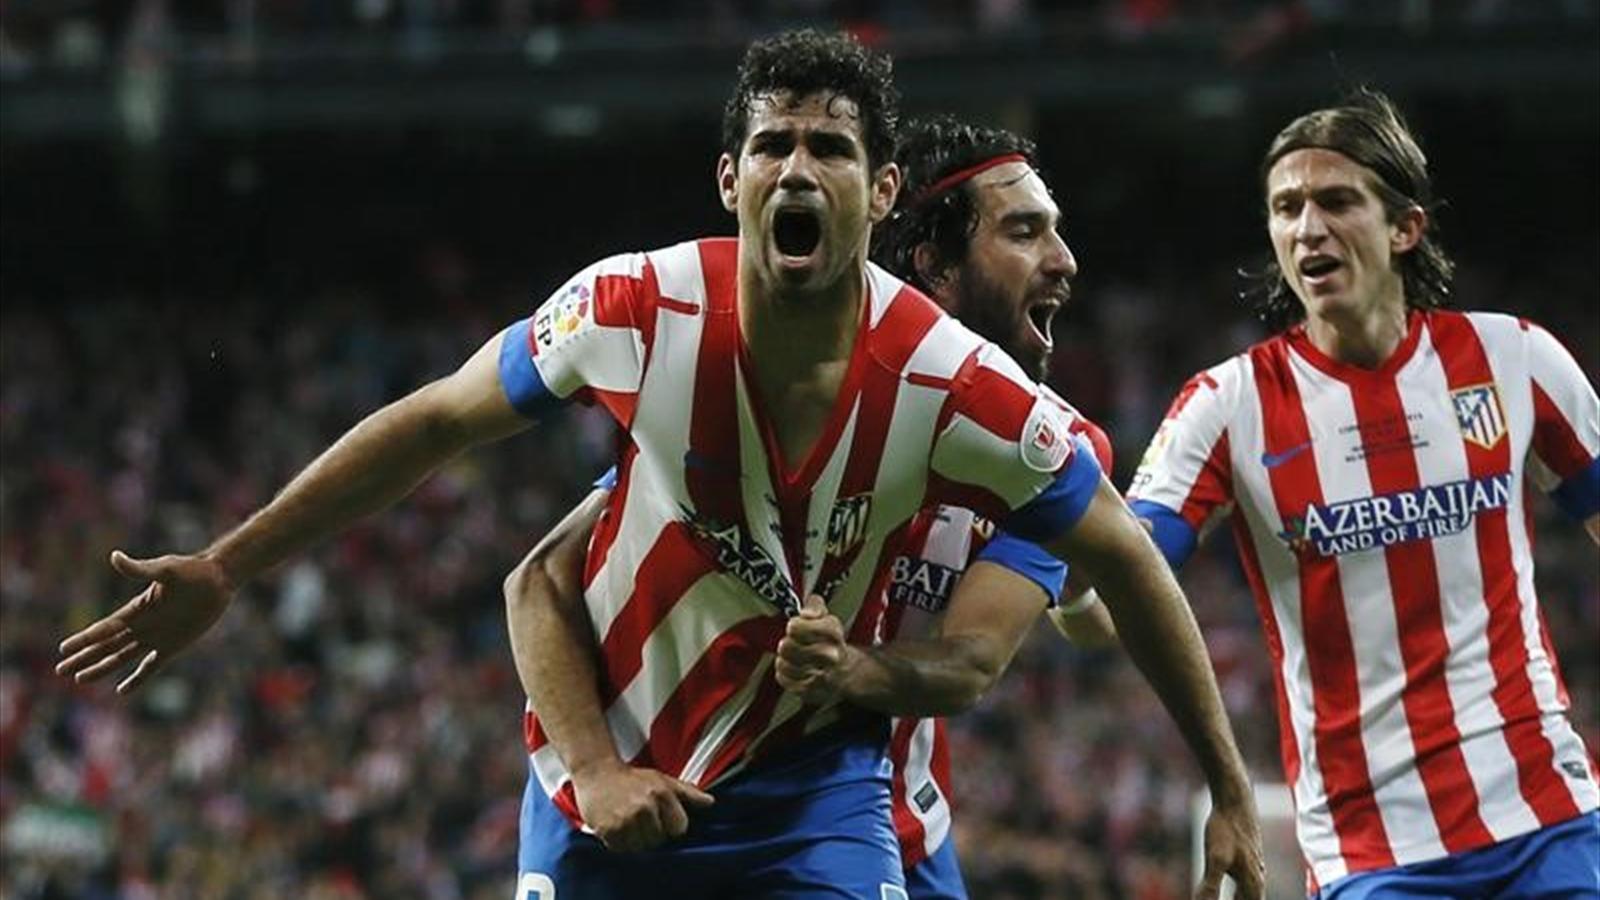 Atletico Madrid'e kötü haber! Diego Costa sakatlandı!